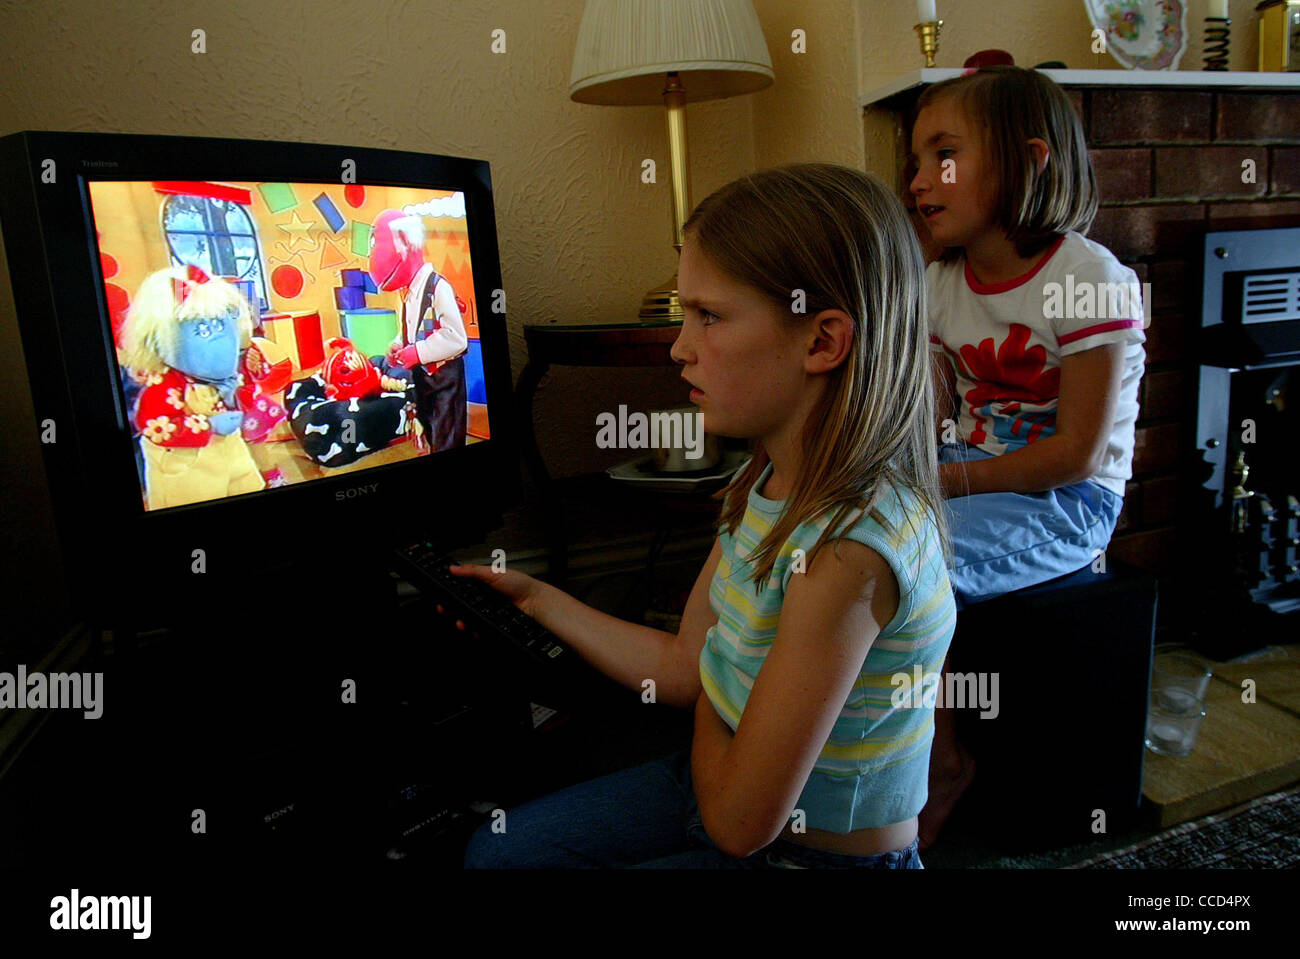 Children watching television. - Stock Image